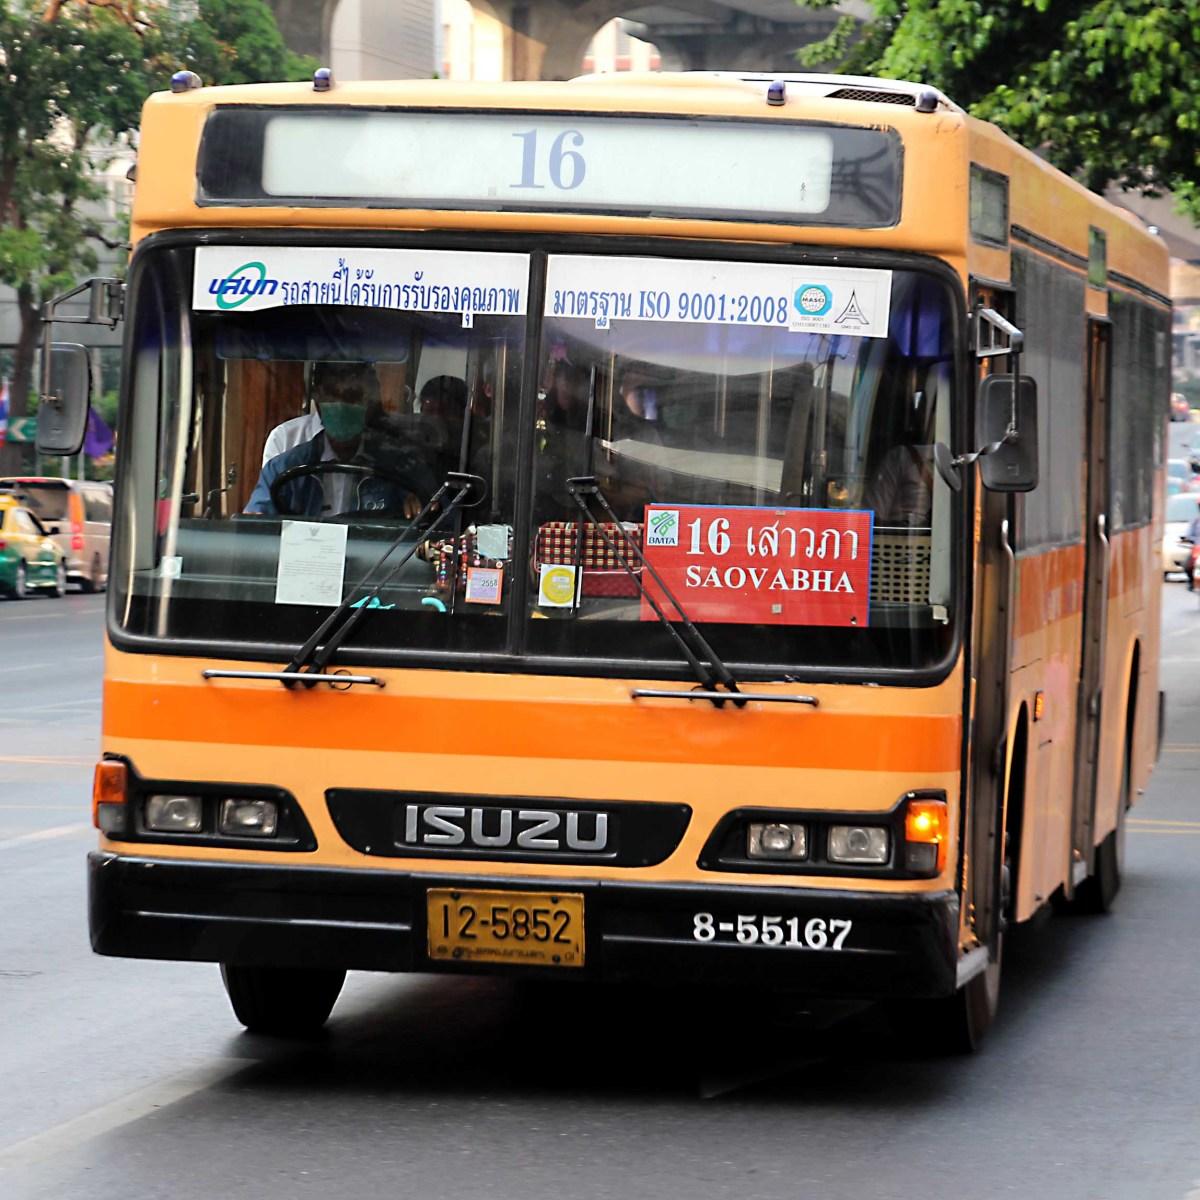 One of the Bangkok city buses